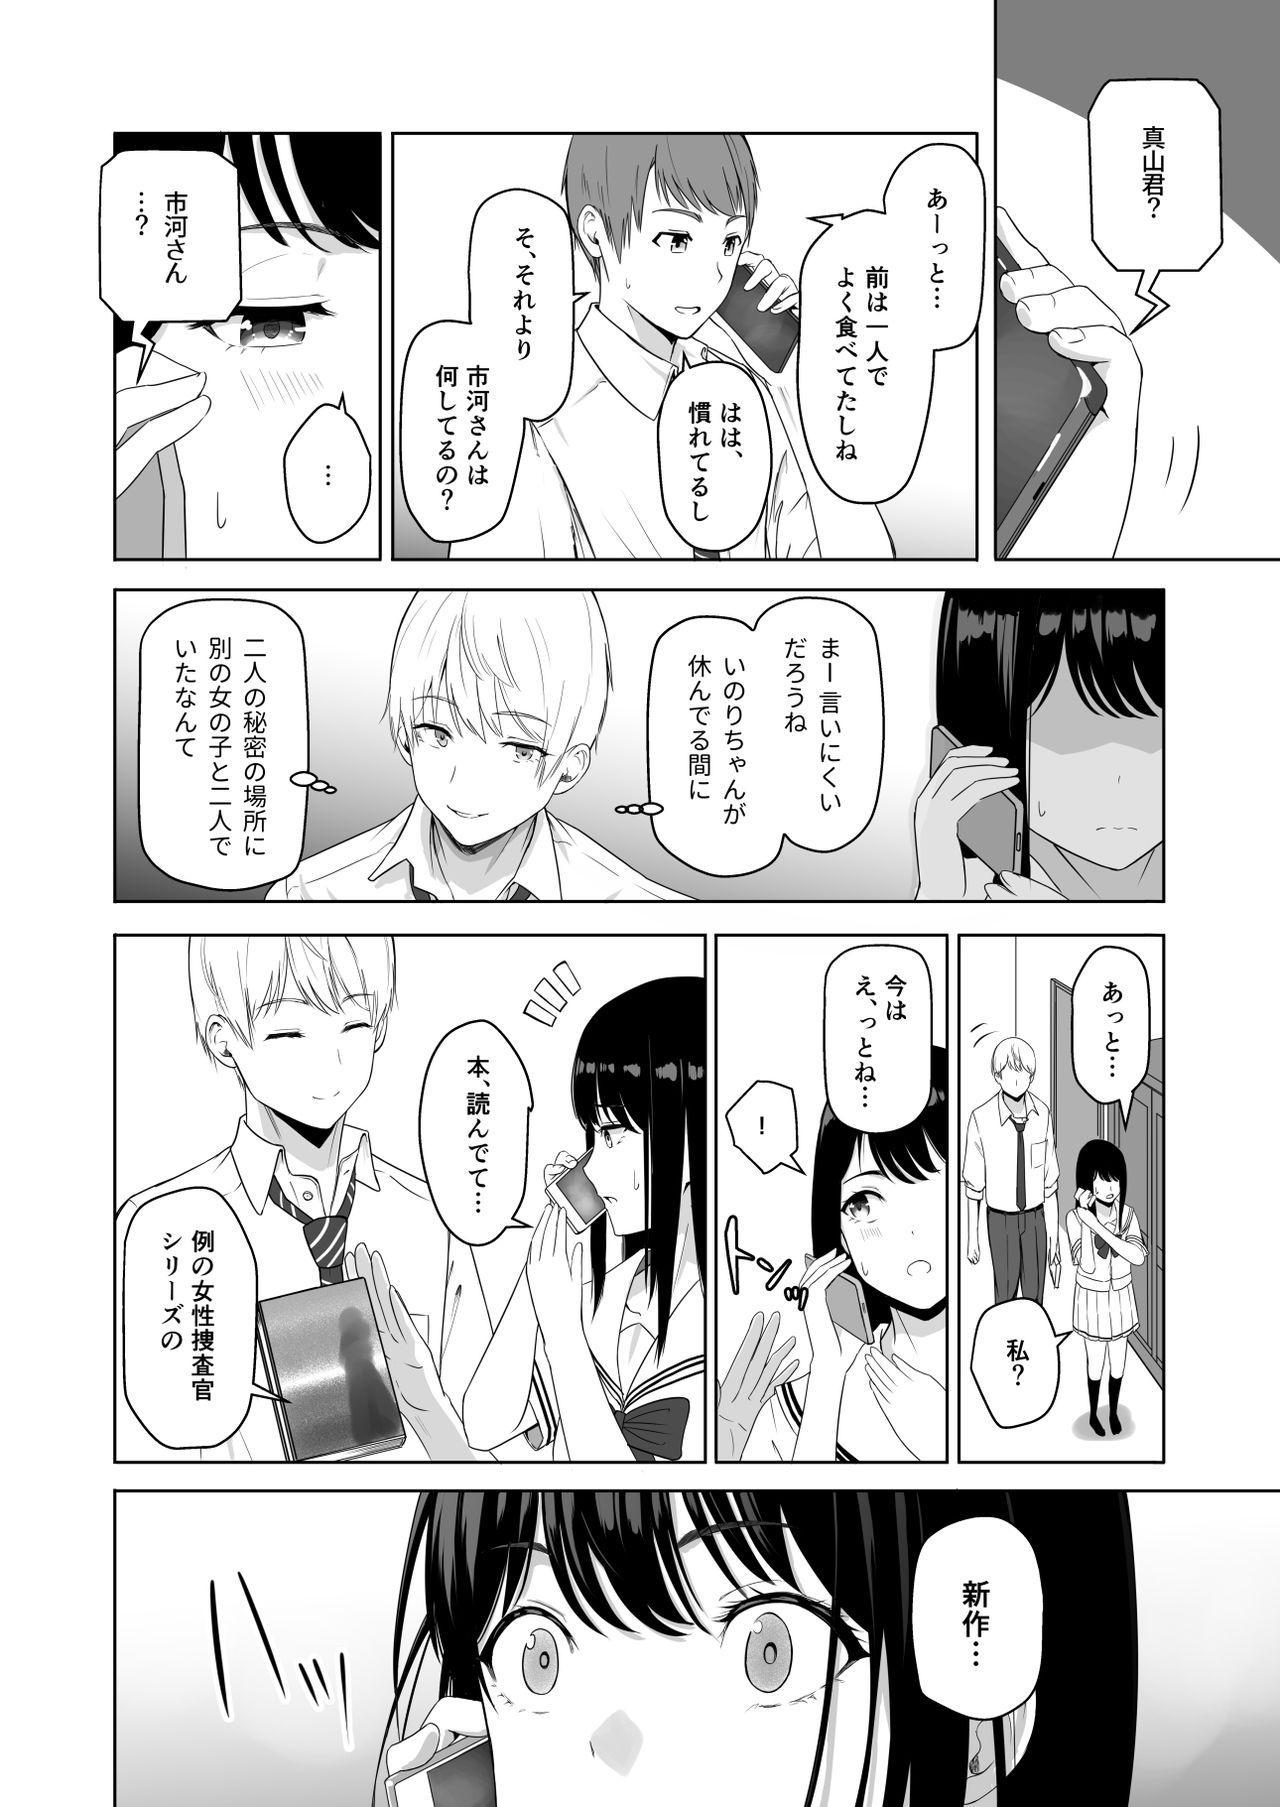 Kimi ga Tame. 2 Ichikawa Inori 44